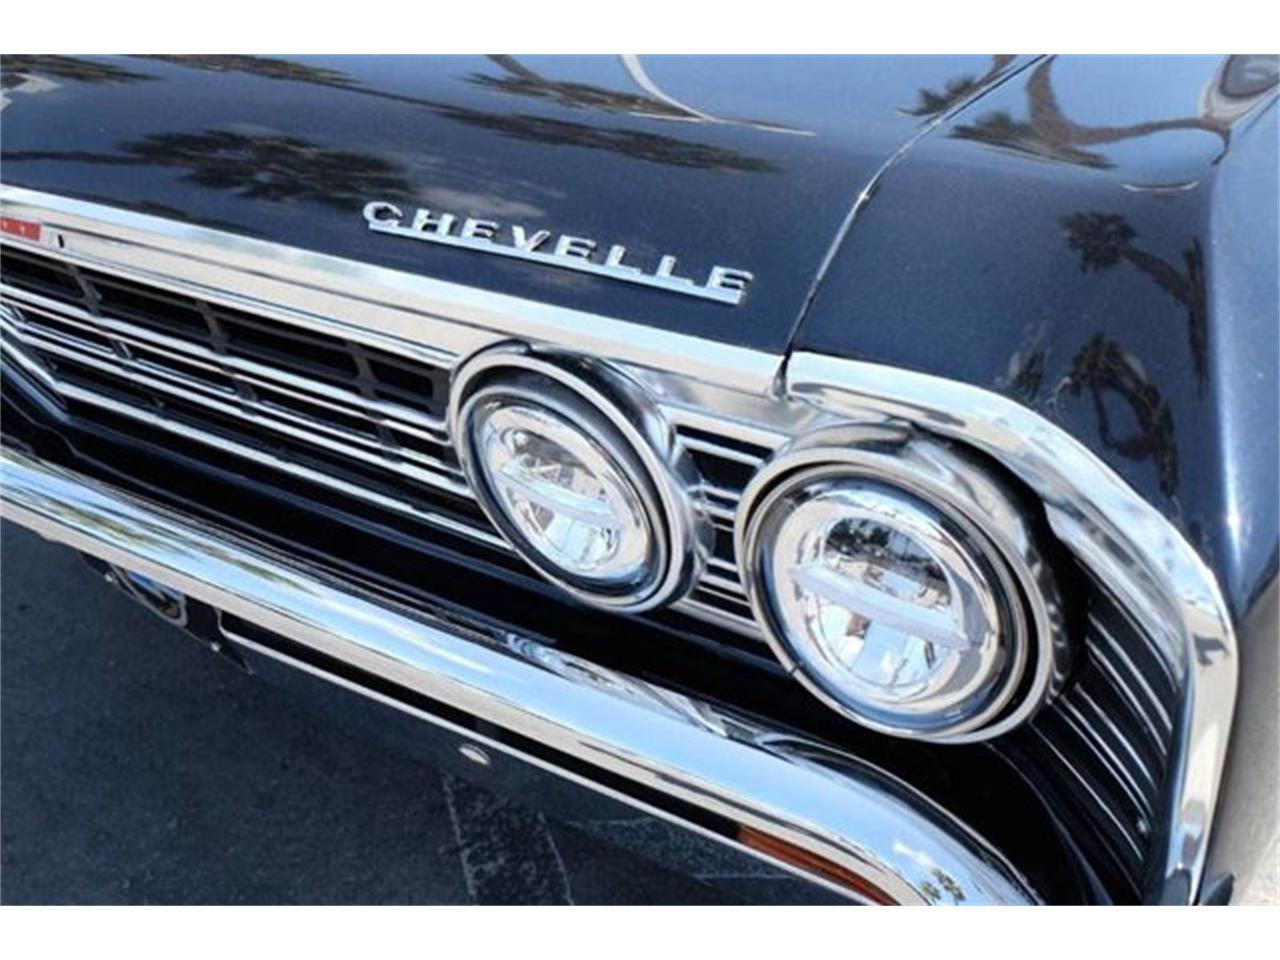 1967 Chevrolet Chevelle Malibu (CC-1255474) for sale in Long Island, New York